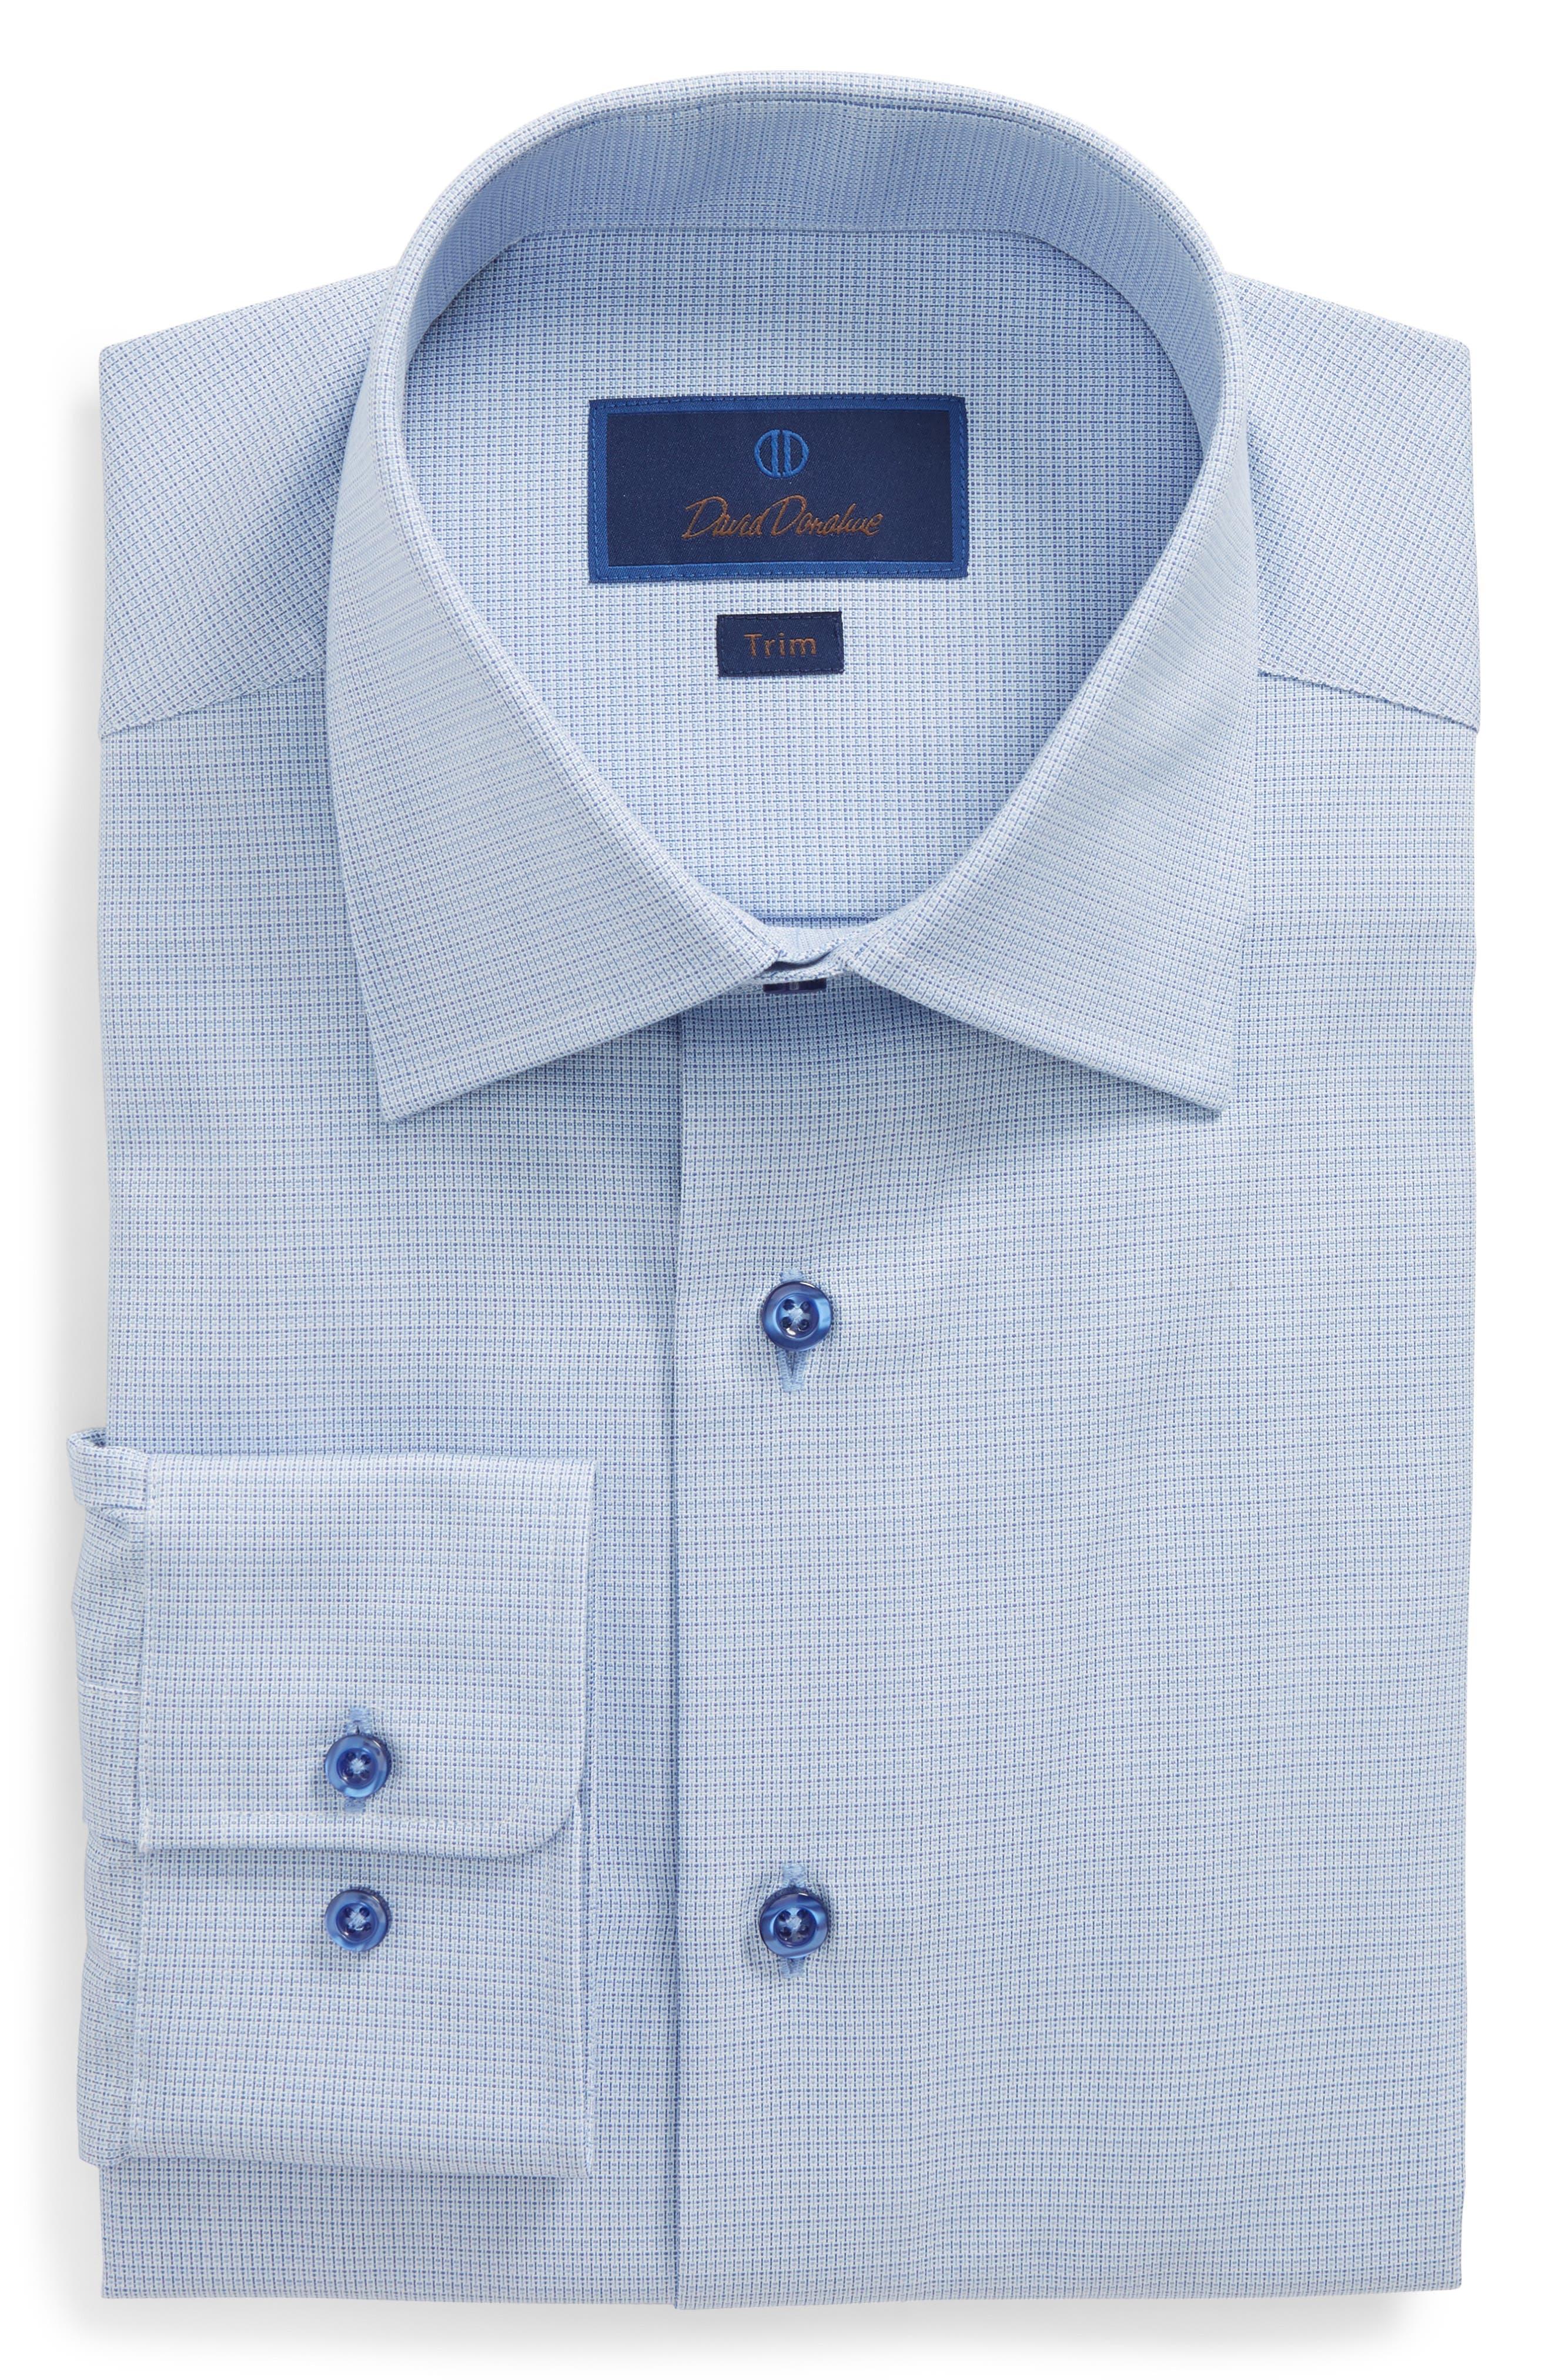 David Donahue Trim Fit Solid Dress Shirt